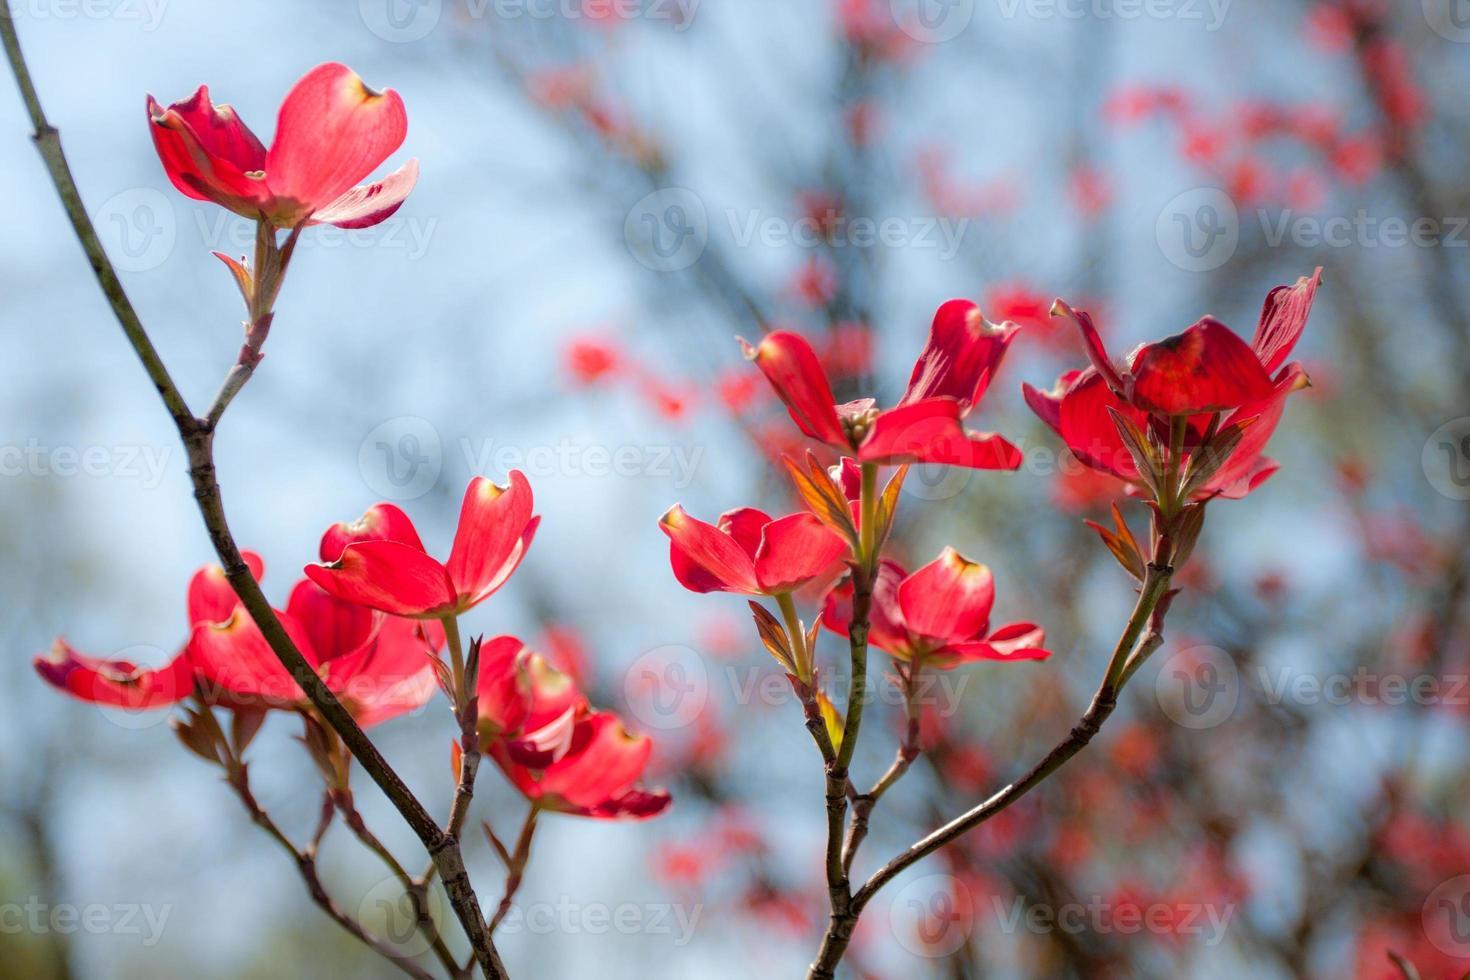 dunkelrosa Hartriegelblüten gegen hellblauen Himmel foto